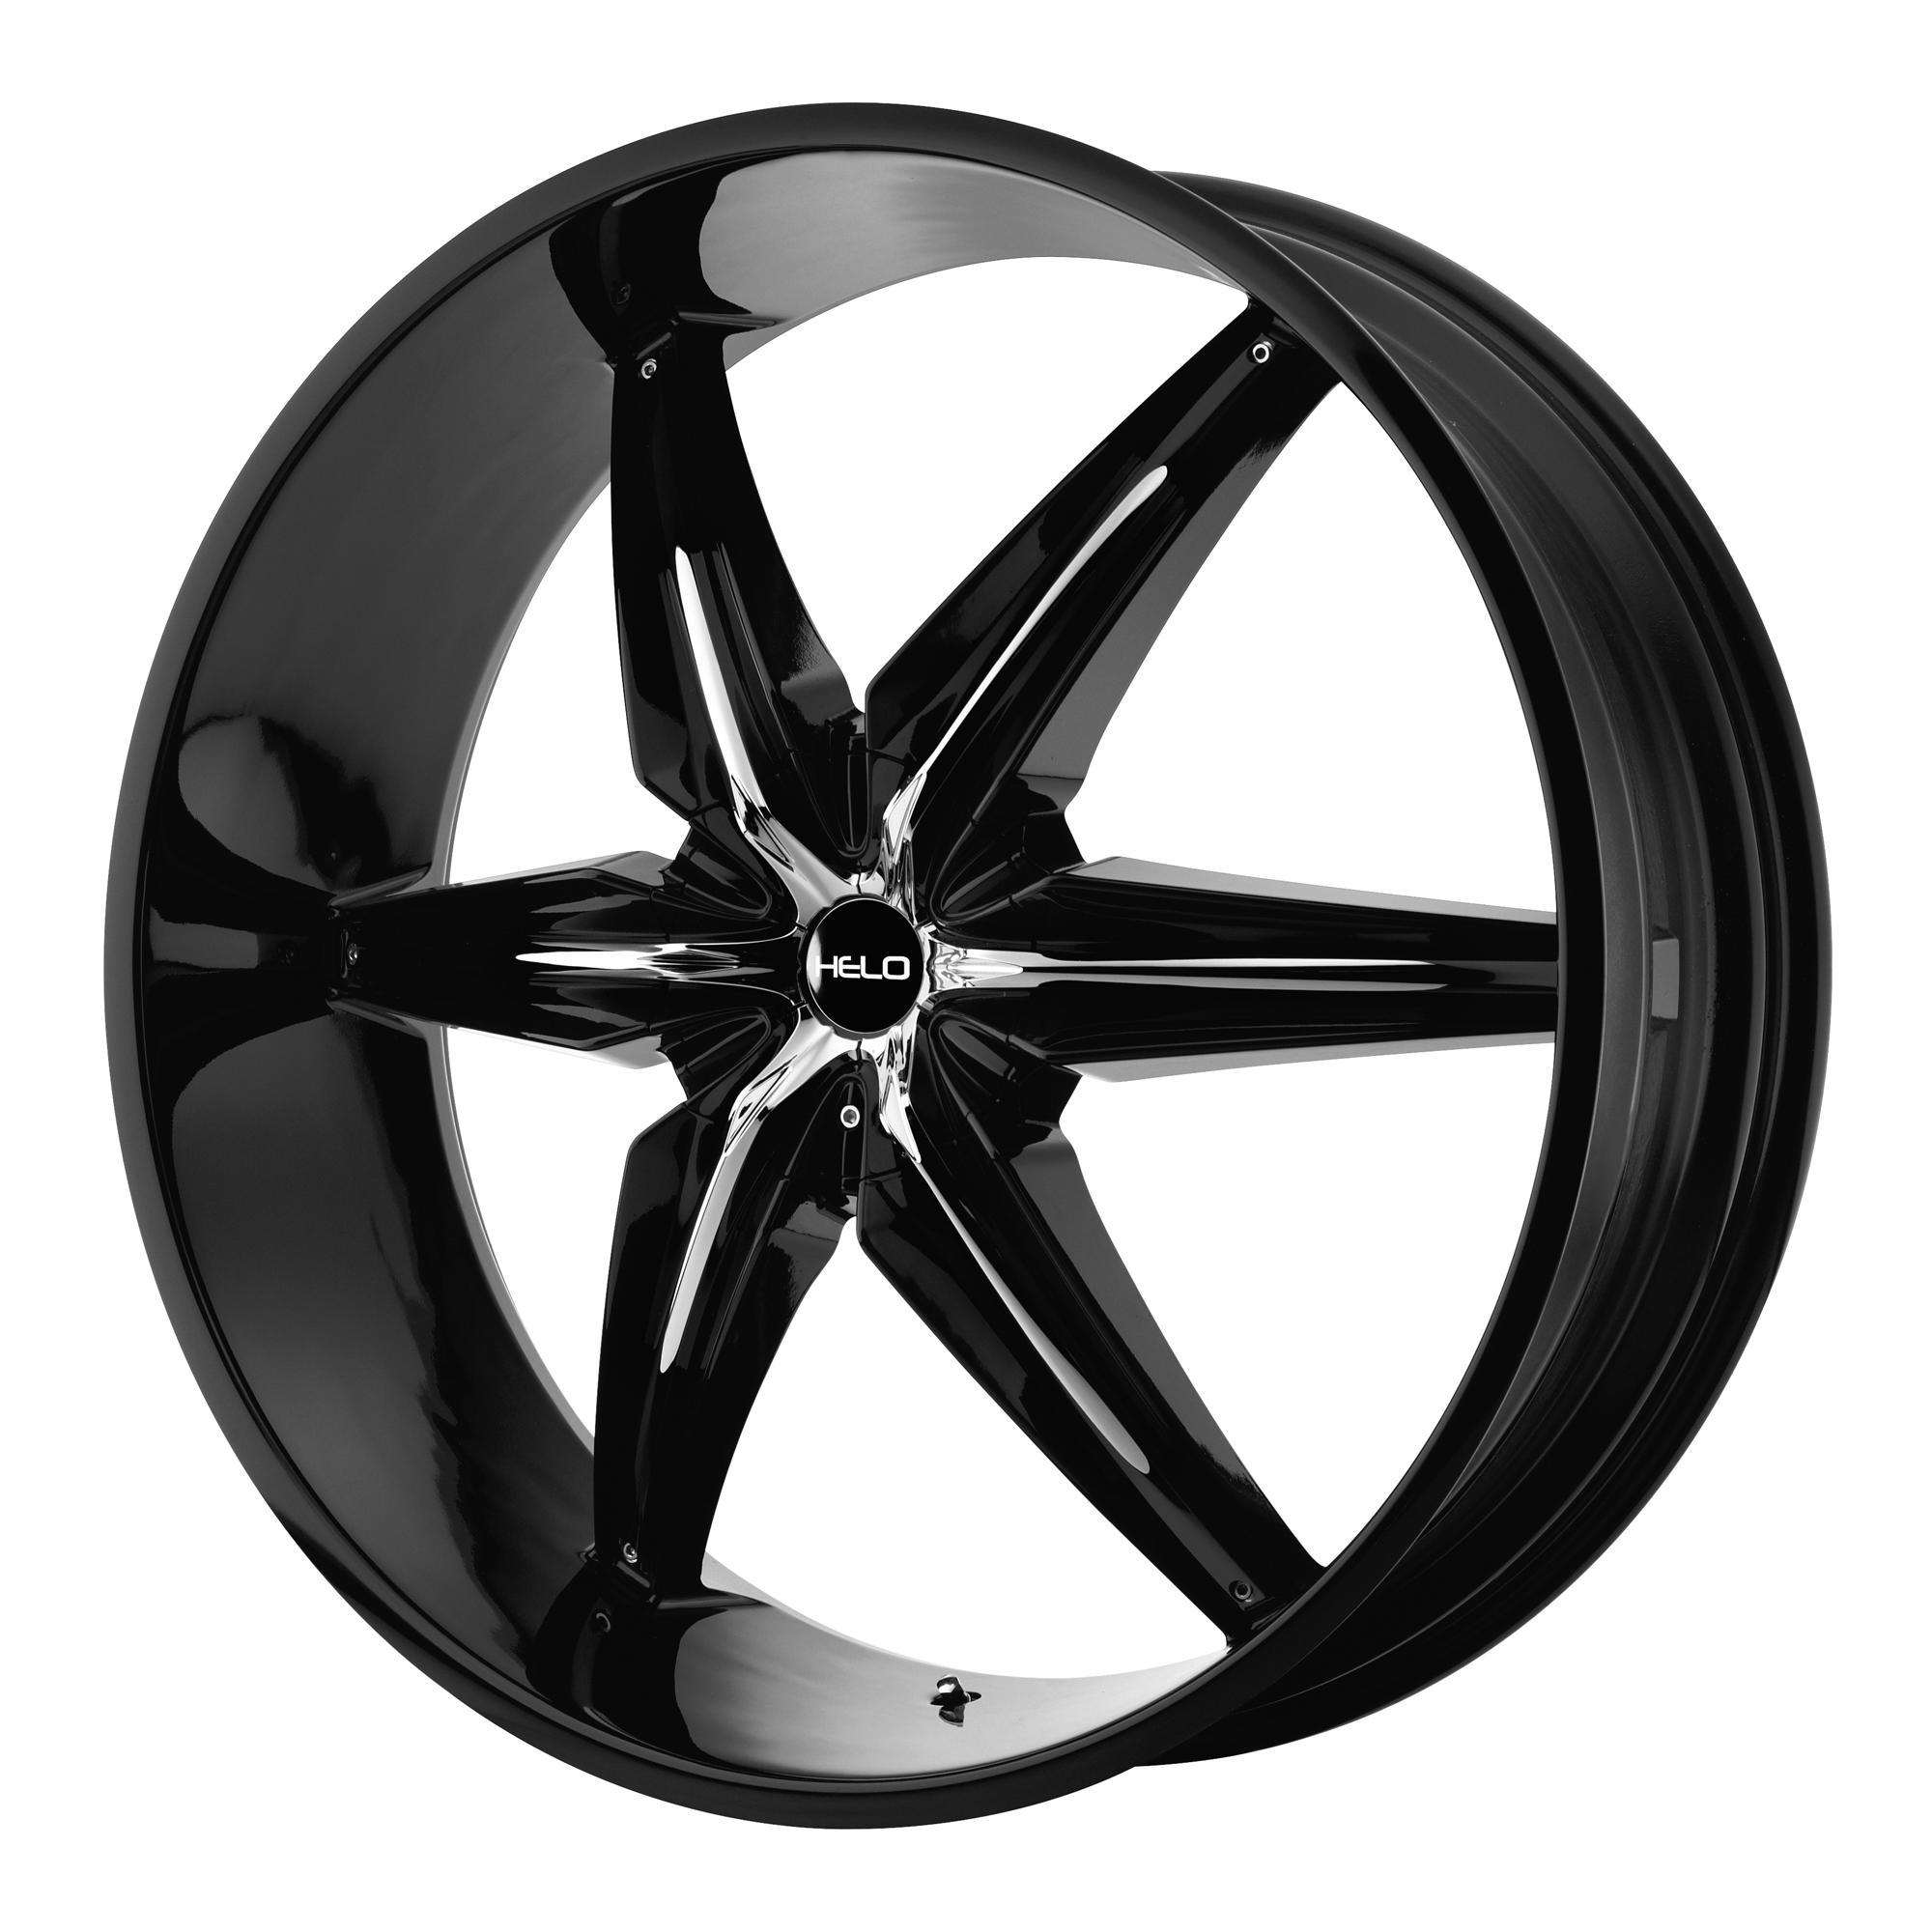 Helo Wheels HE866 Gloss Black w/ Chrome Accents